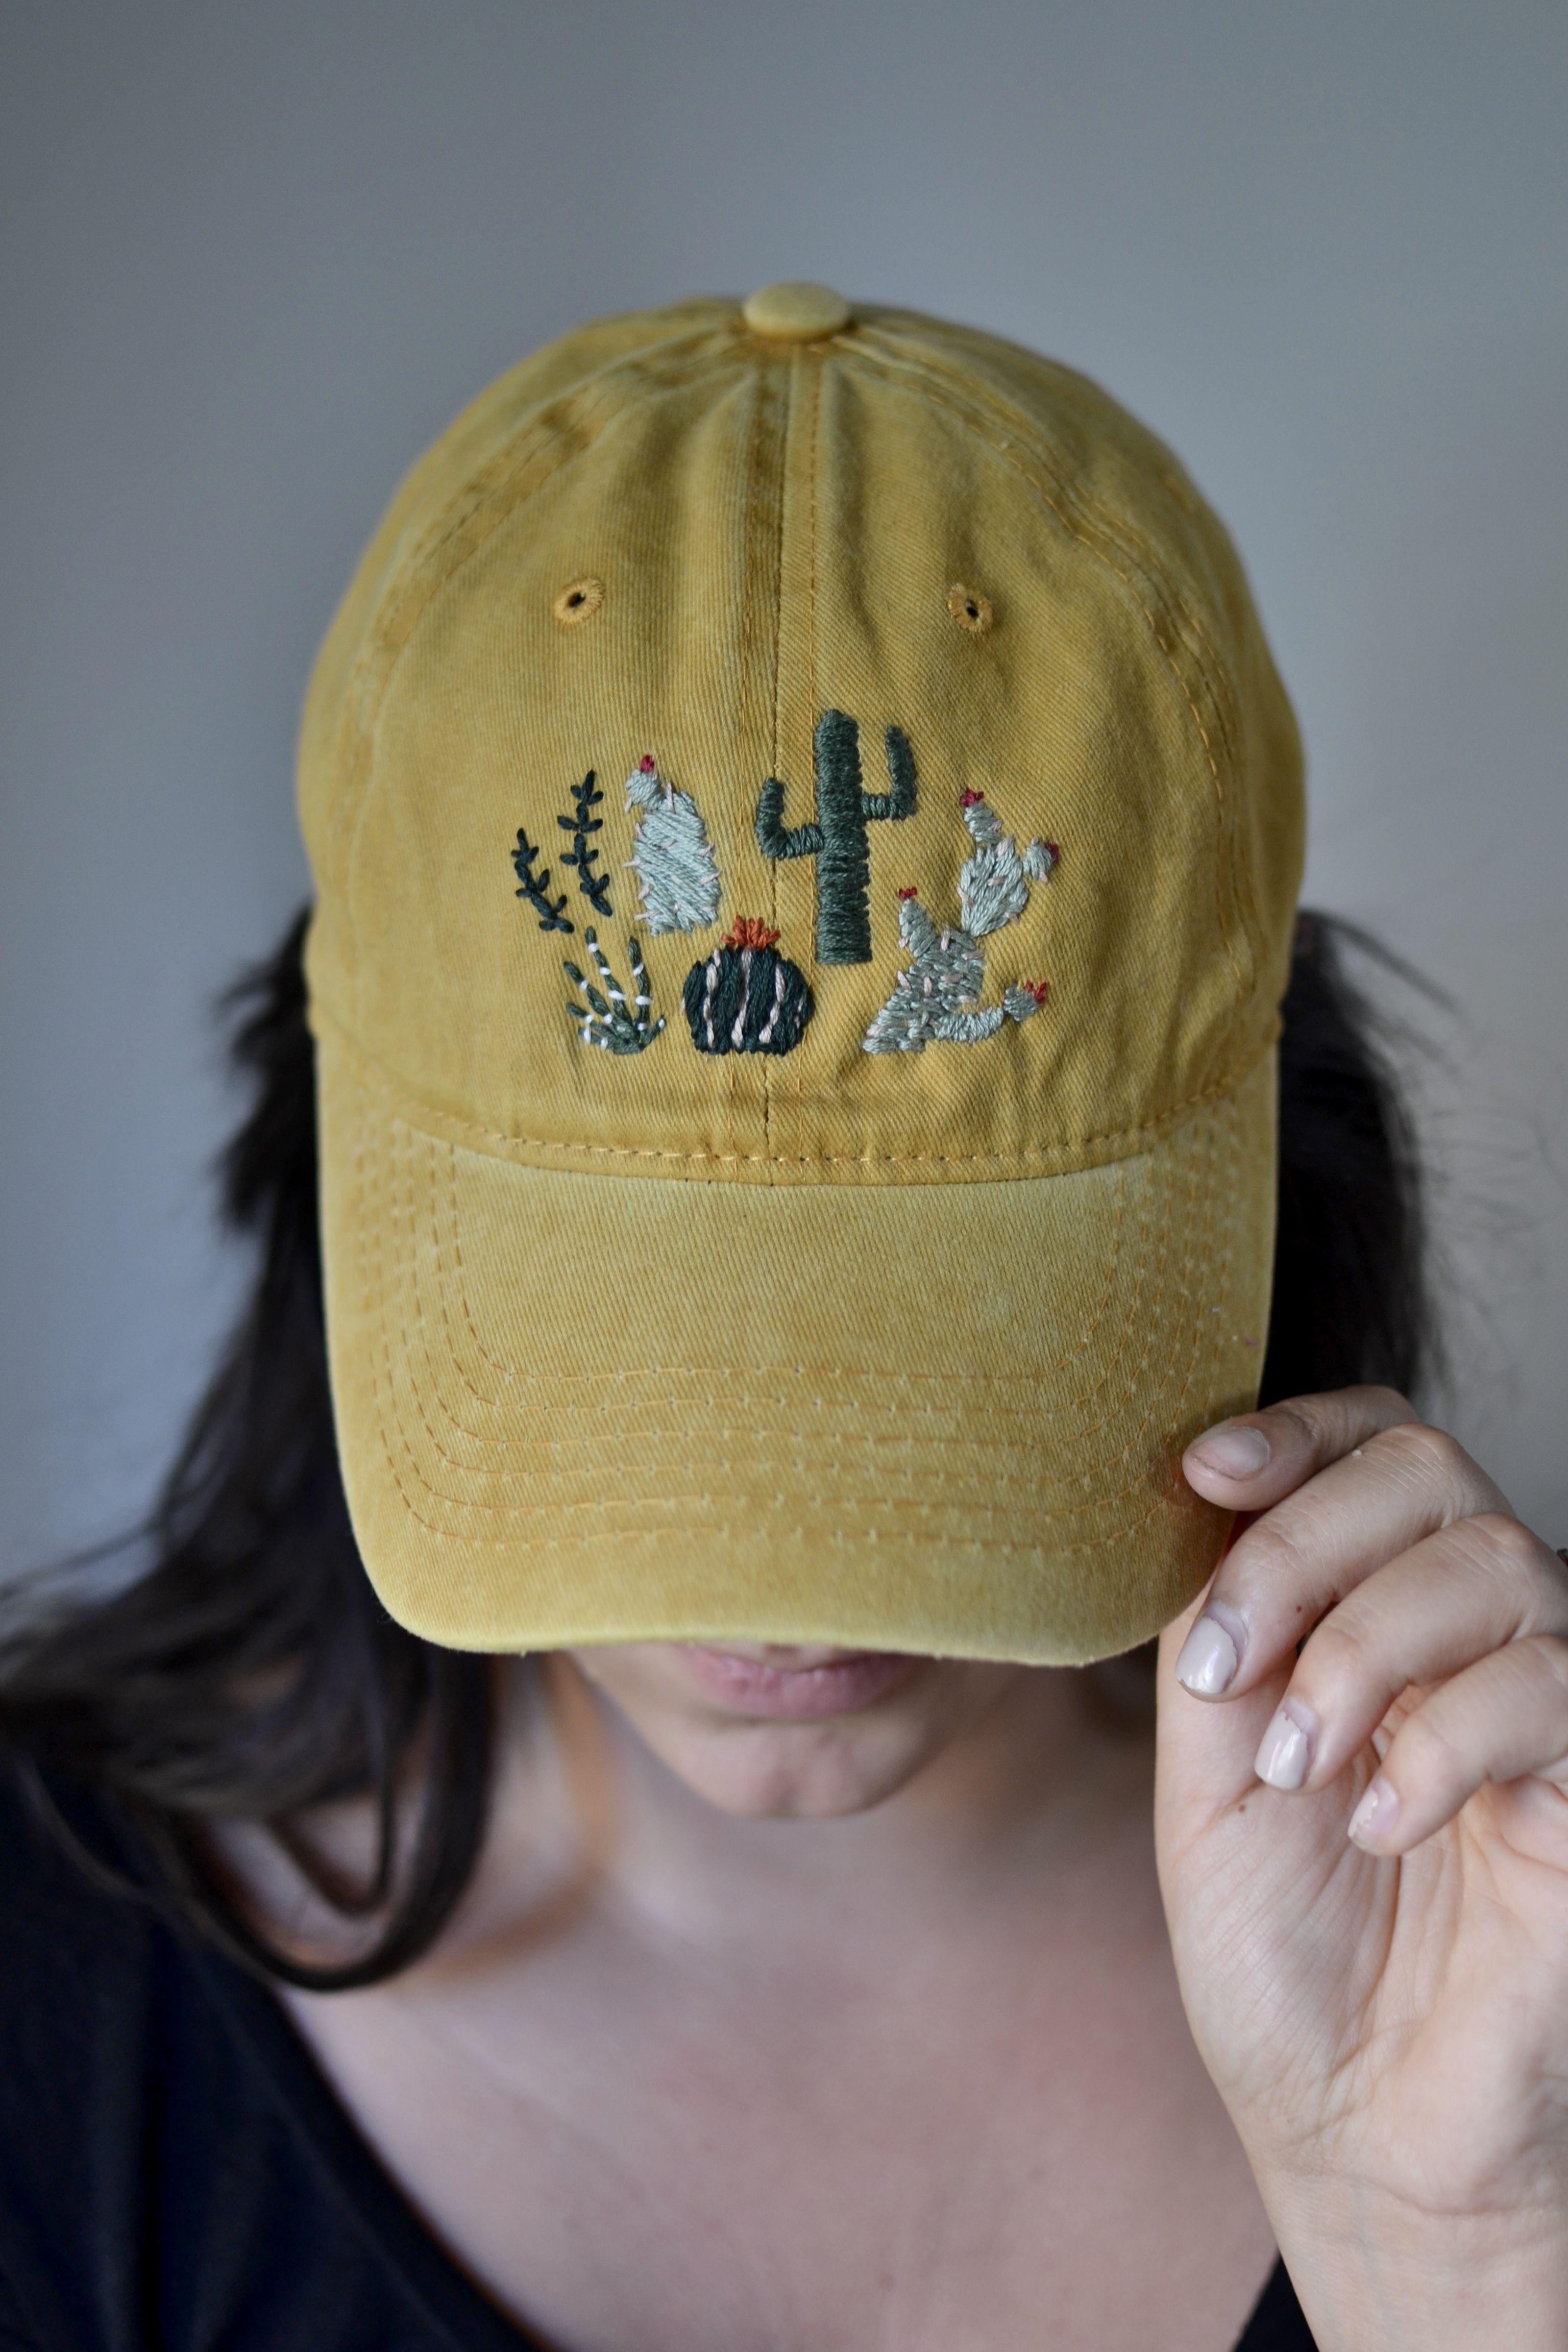 Handmade Embroidered Cactus Mustard Hat Hat Embroidery Embroidered Hats Painted Hats